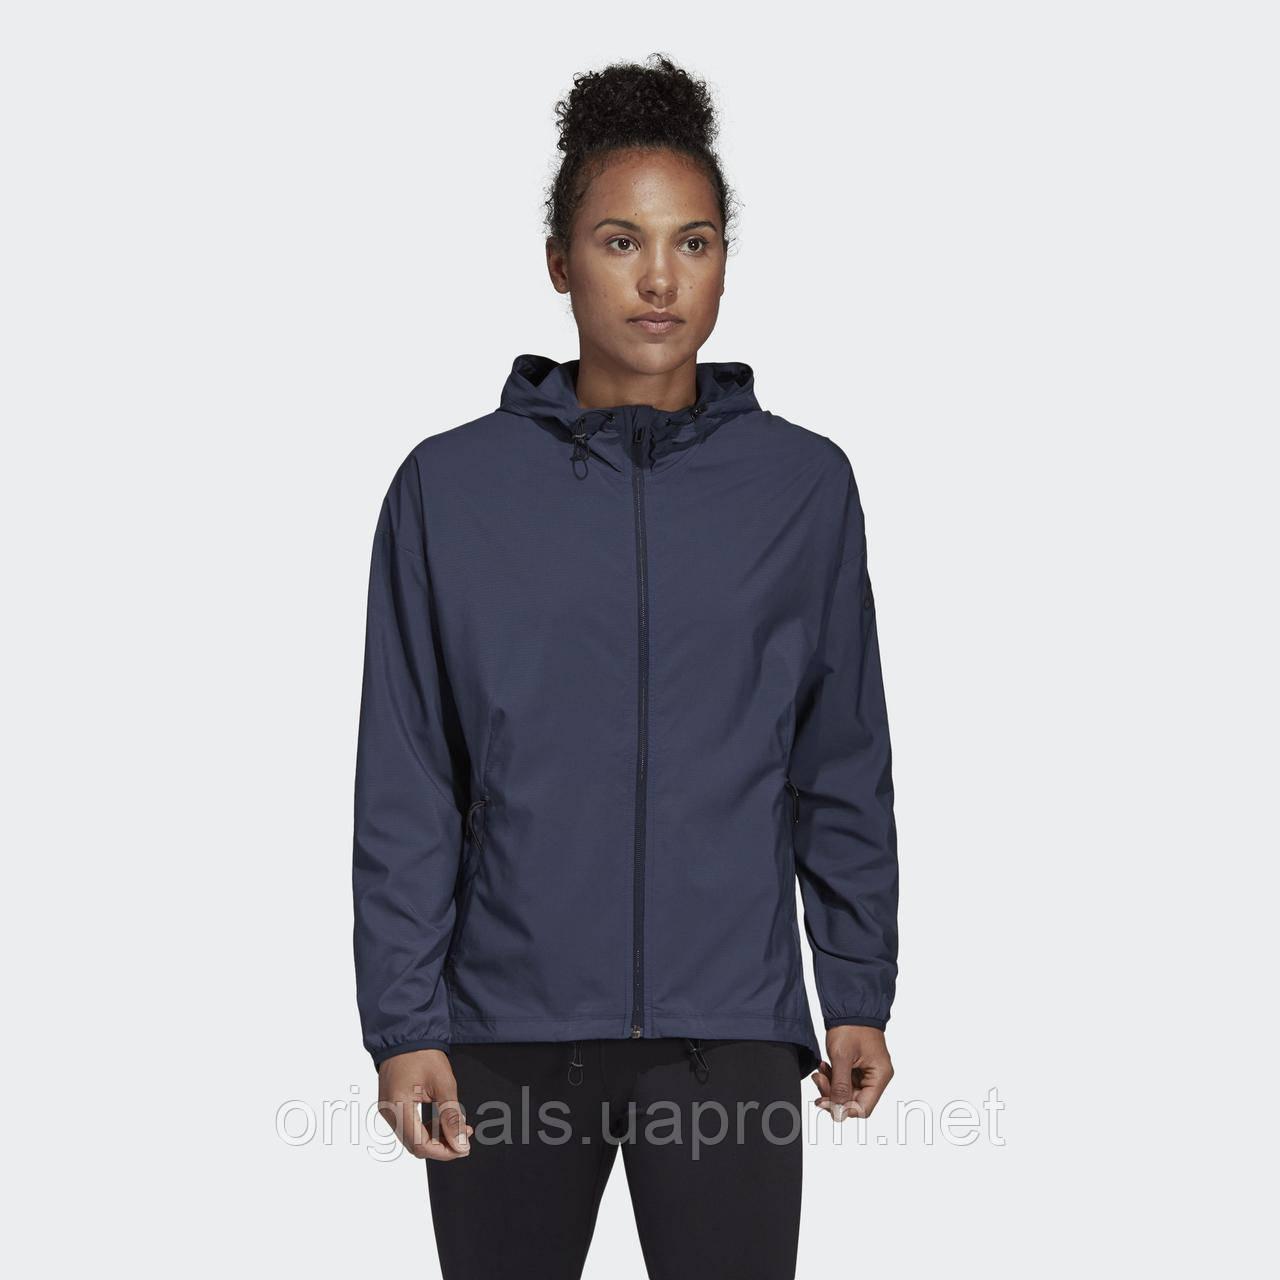 Женский куртка Adidas Woven Cover Up DT7529